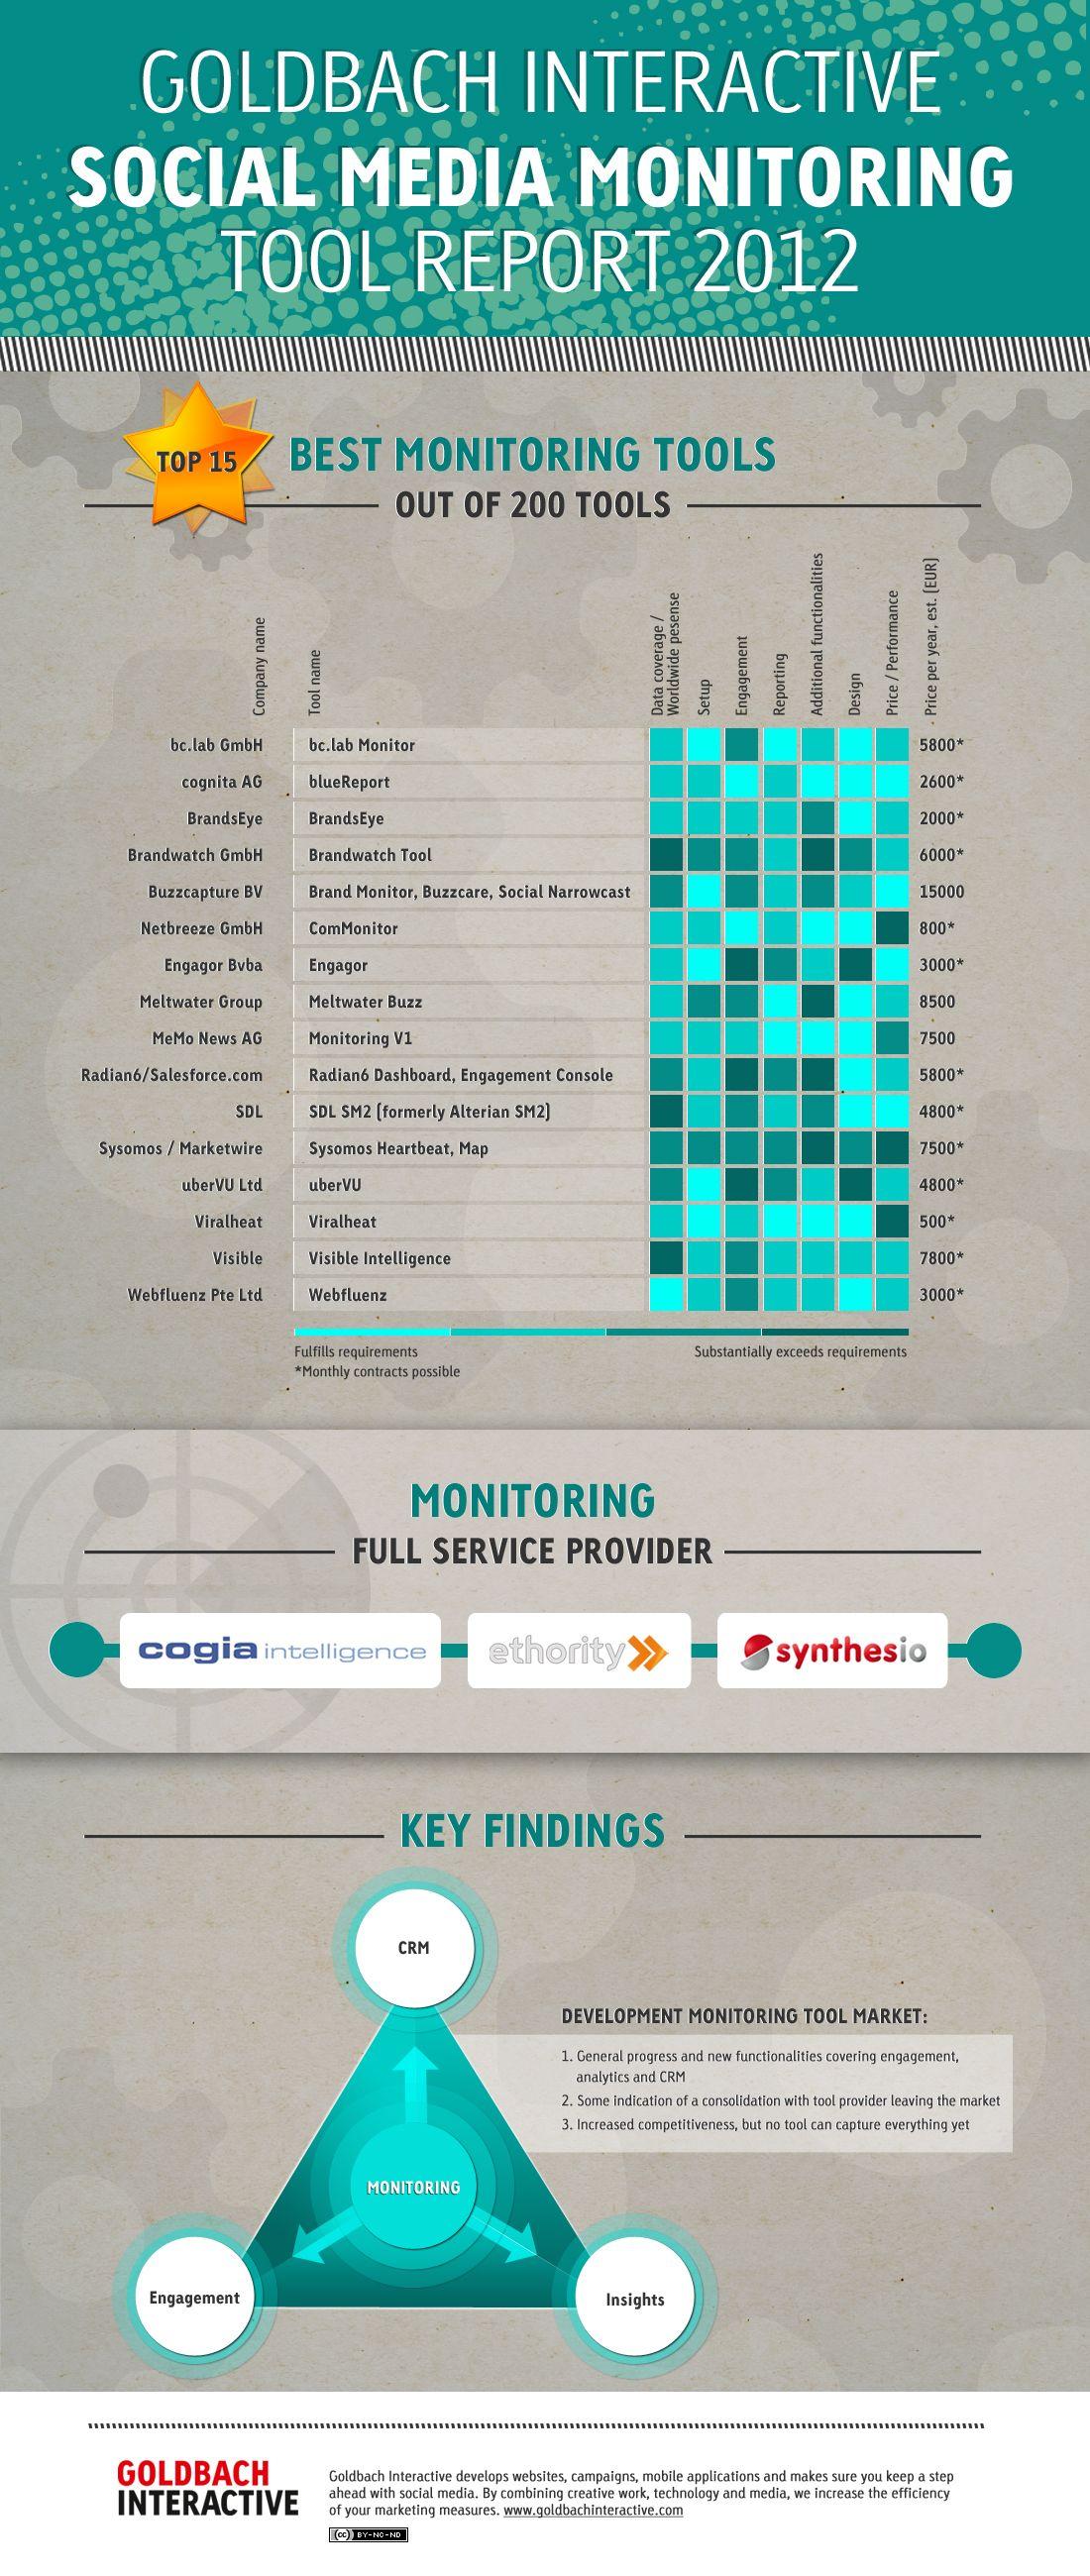 Social Media Monitoring Tool Report 2012. #Infographic